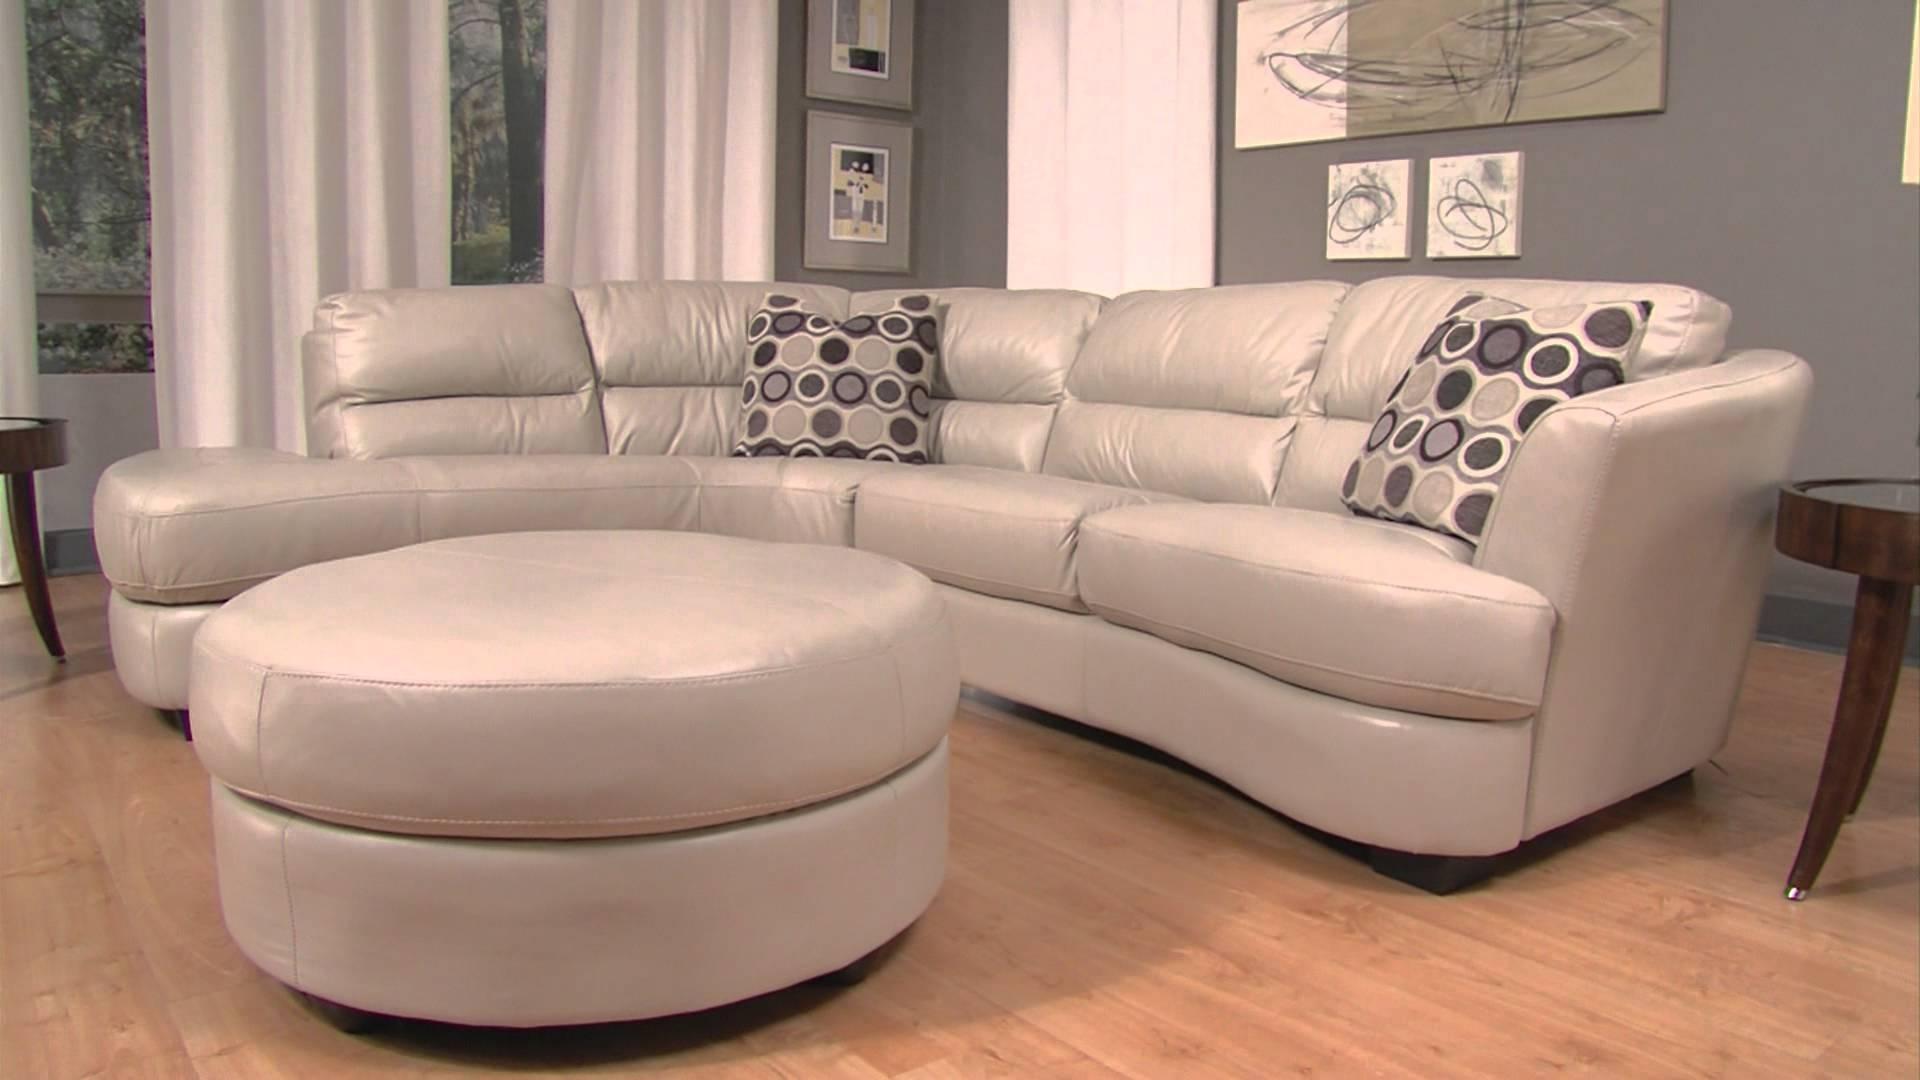 Popular Berkline Sectional Sofas In Berkline Sectional Sofa – Hotelsbacau (View 18 of 20)